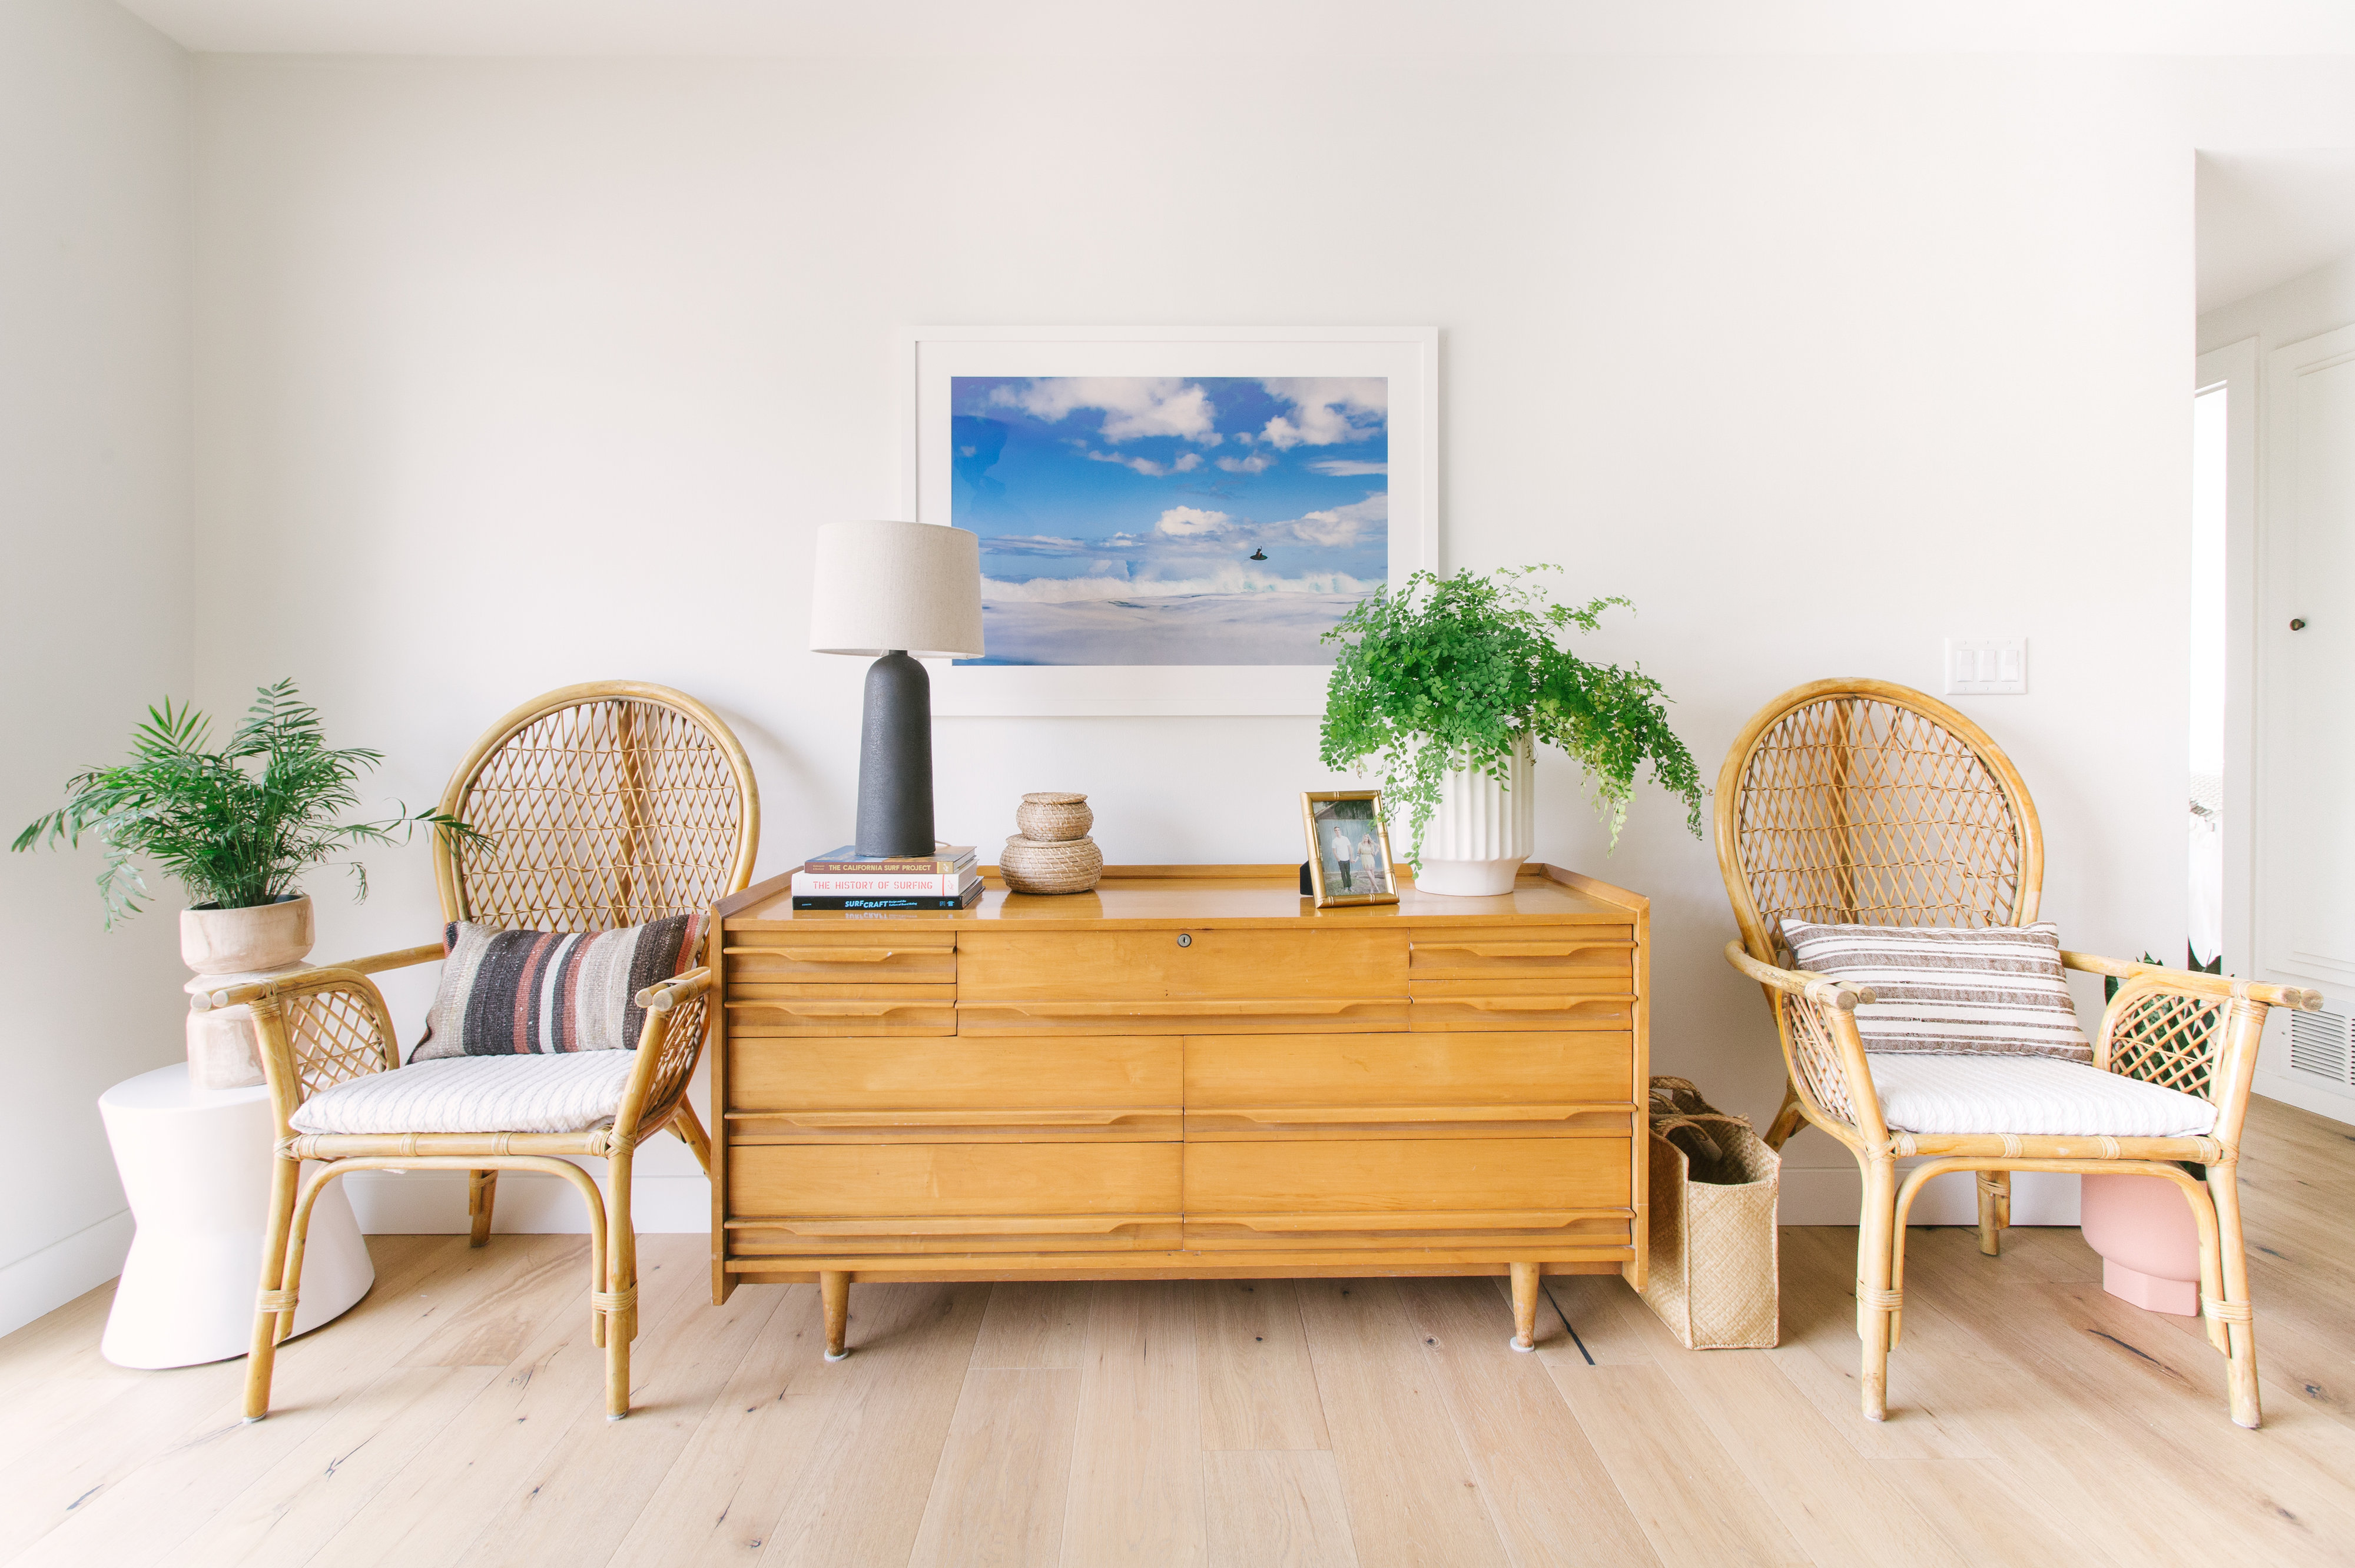 Clean california bohemian style reno house photos apartment therapy